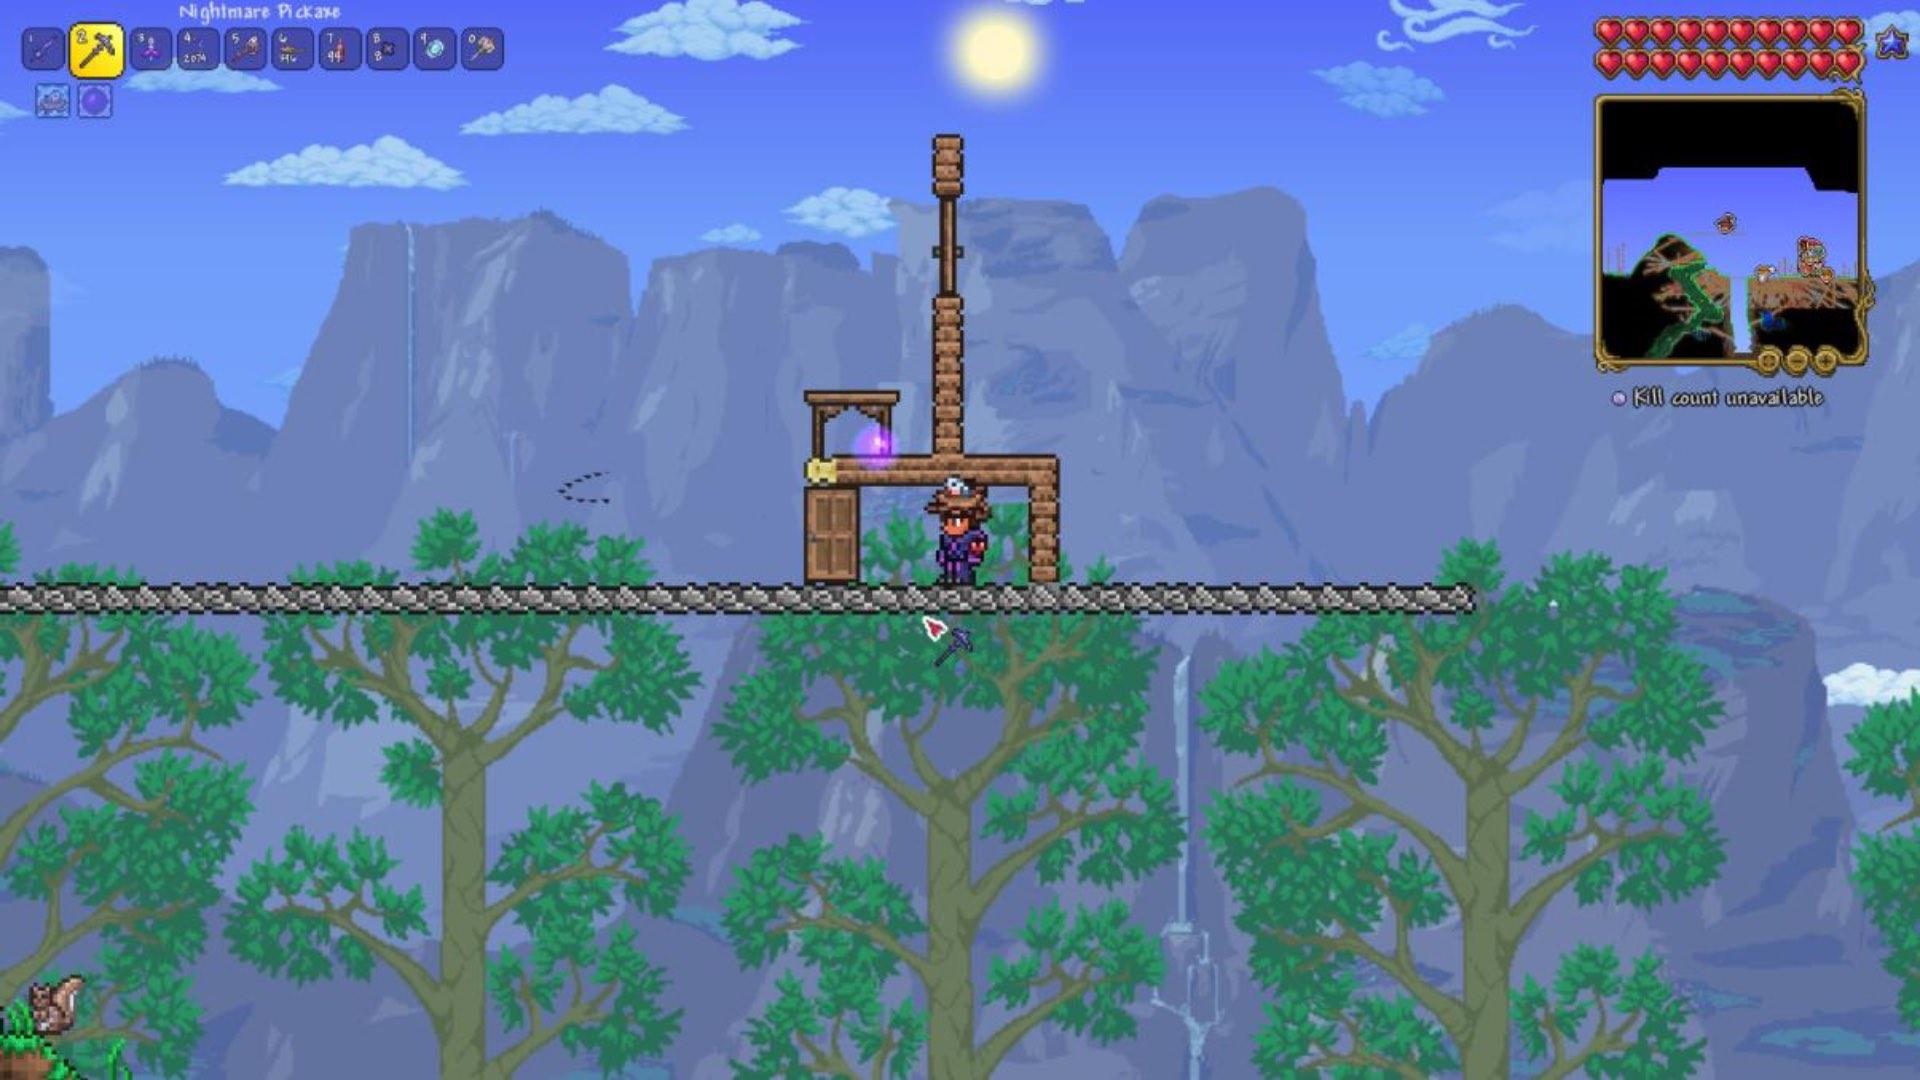 How to duplicate in Terraria Screenshot 1